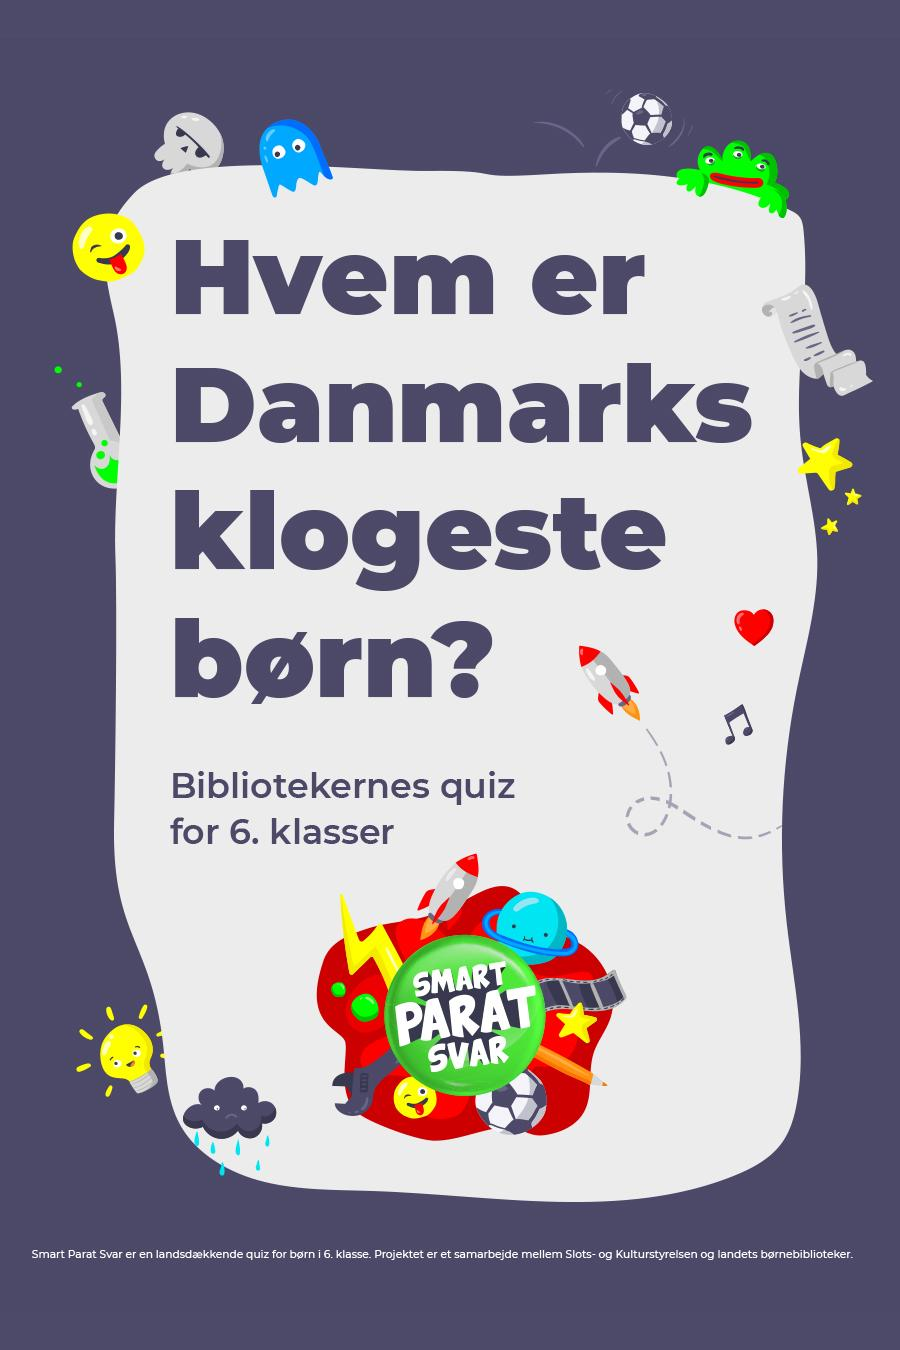 Smart Parat Svar - Danmarks klogeste 6. klasse